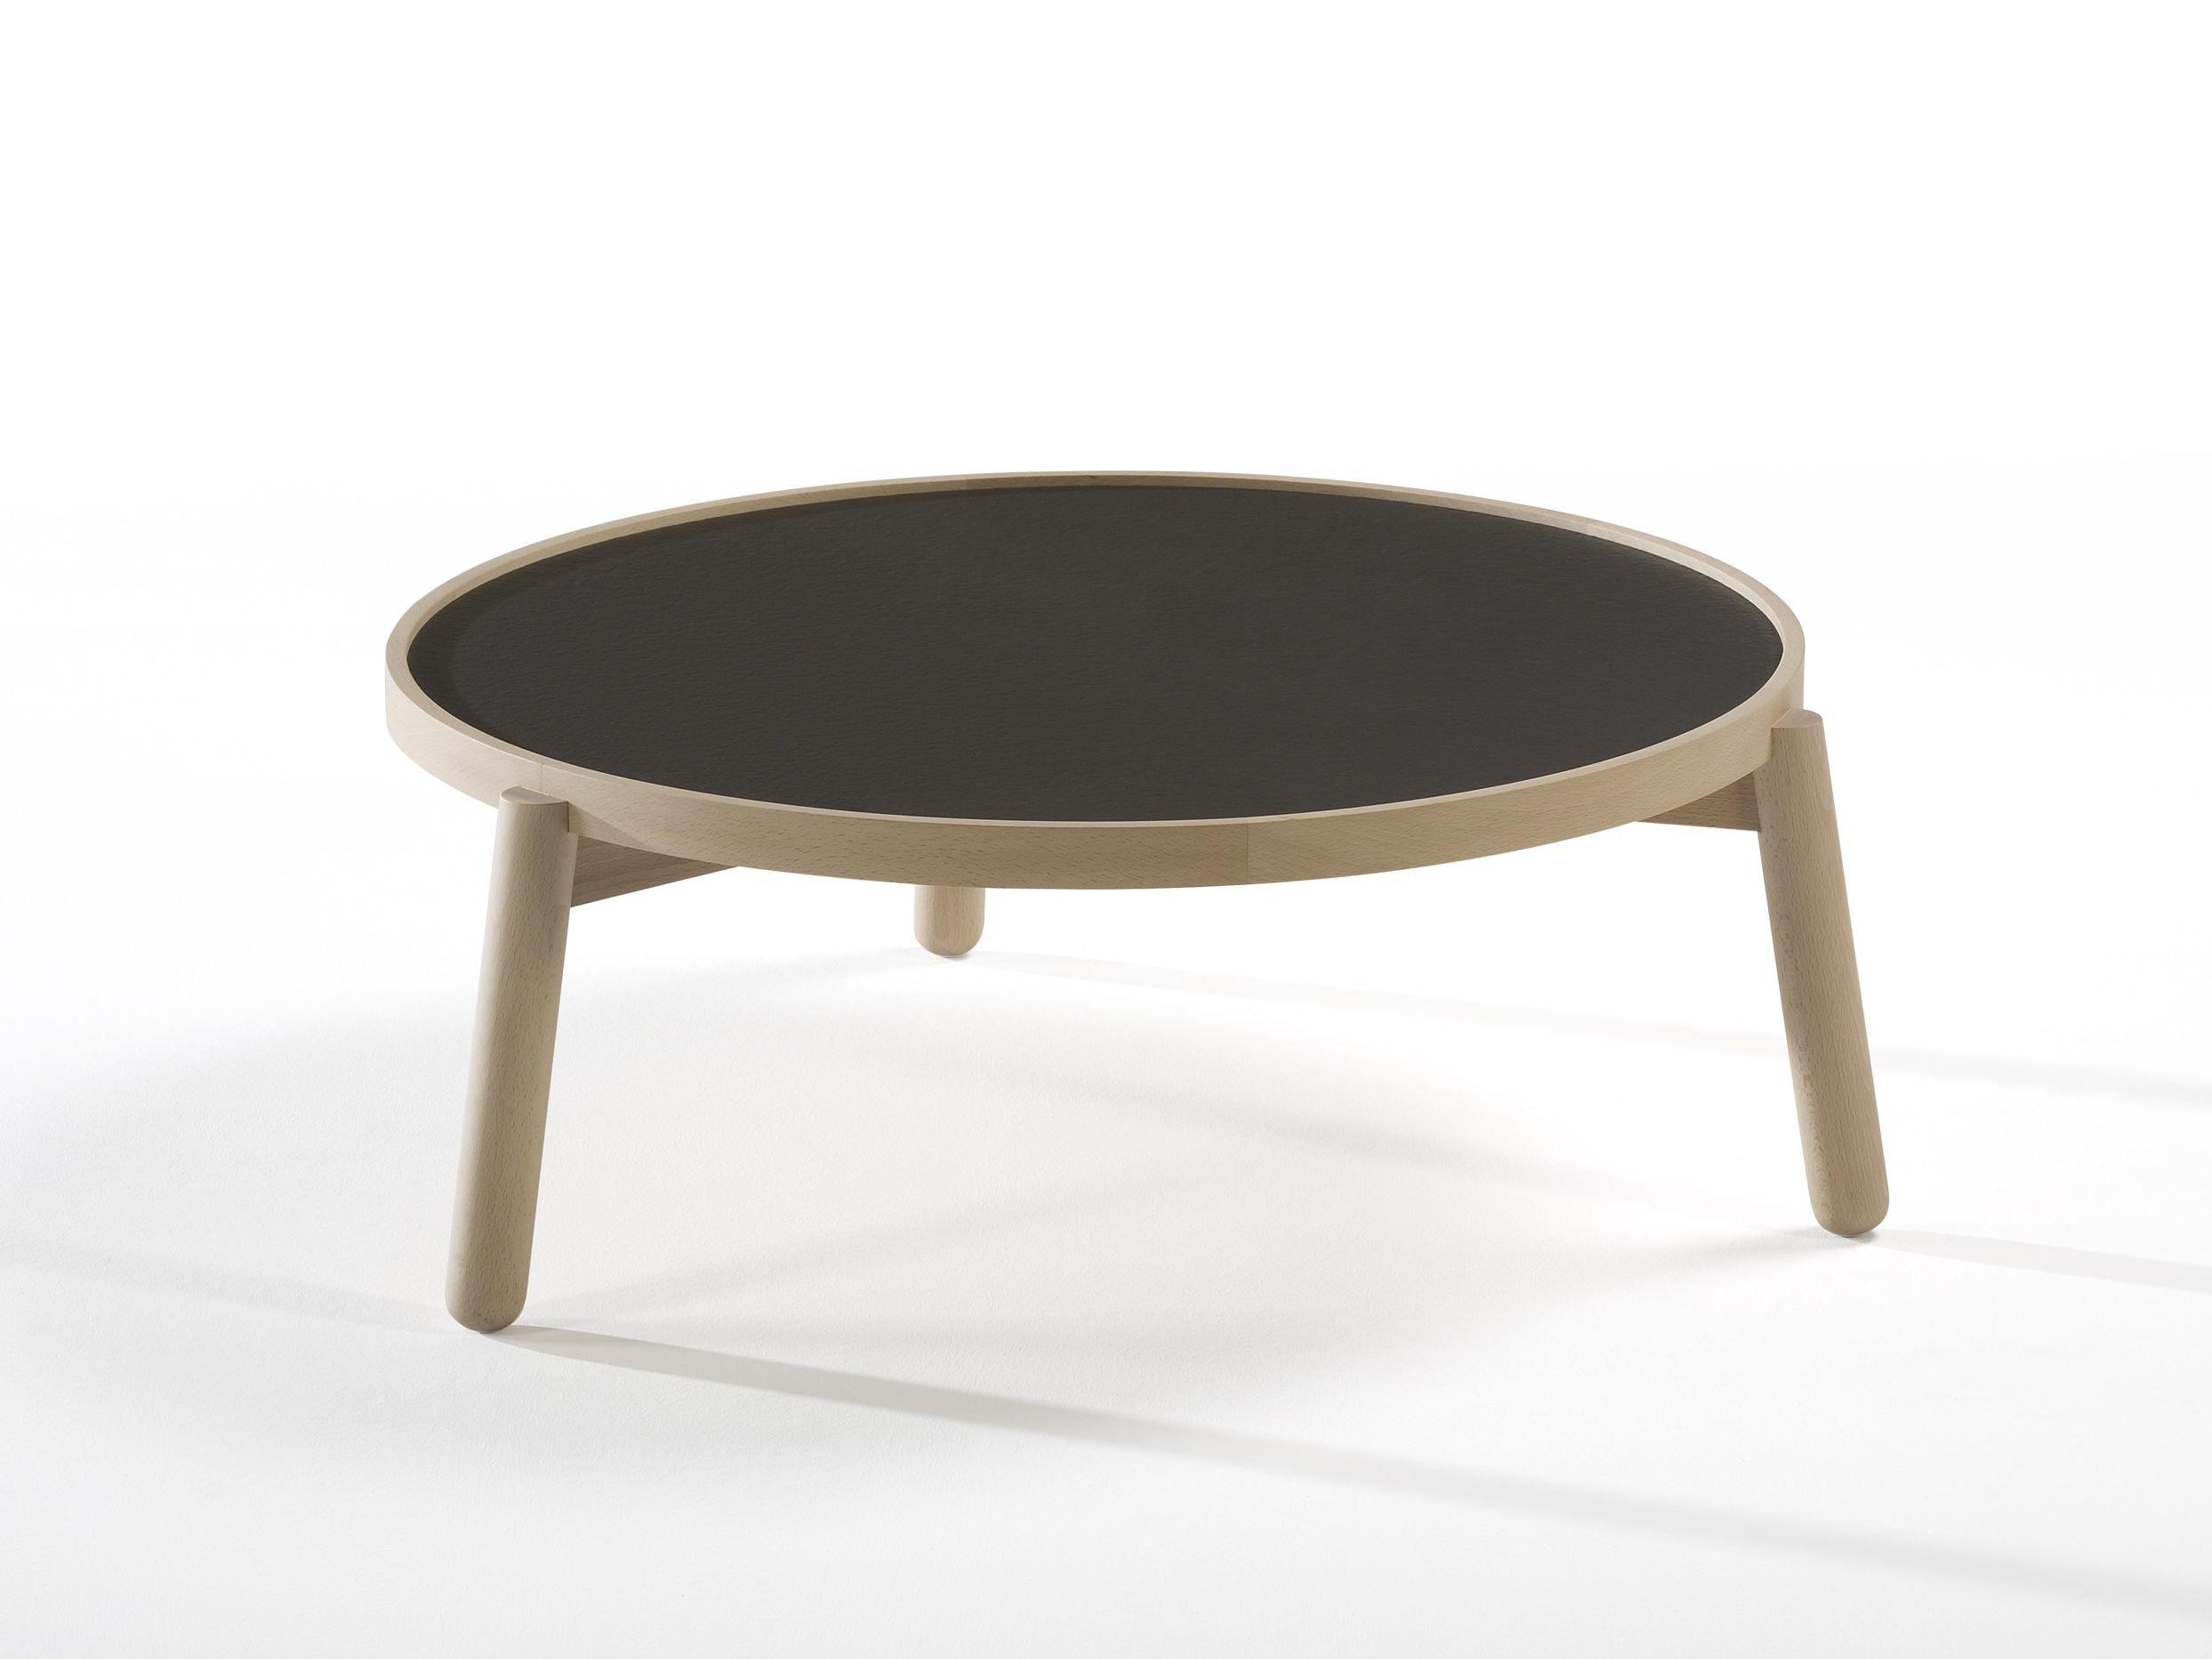 Low Round Coffee Table Van By Kendo Mobiliario Design Francesc Rifé